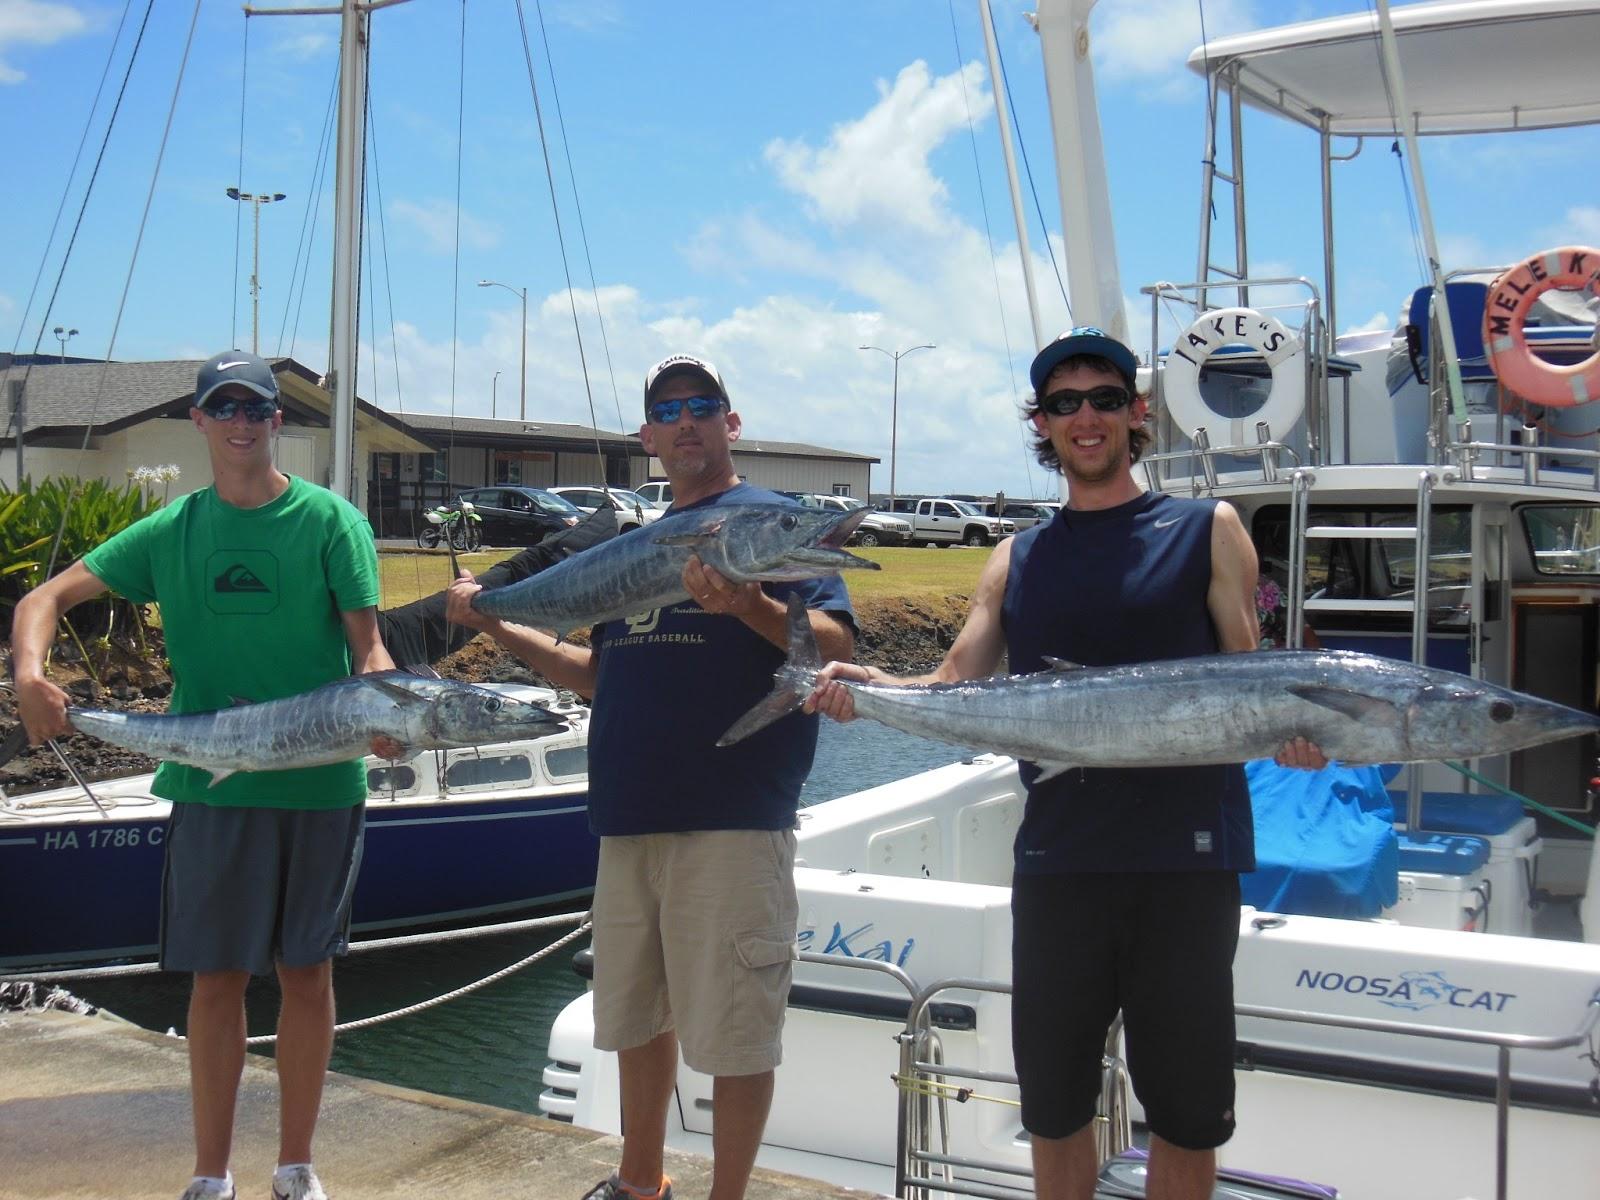 C lure fishing chaters kauai hawaii wahoo fishing in hawaii for Kauai fishing report